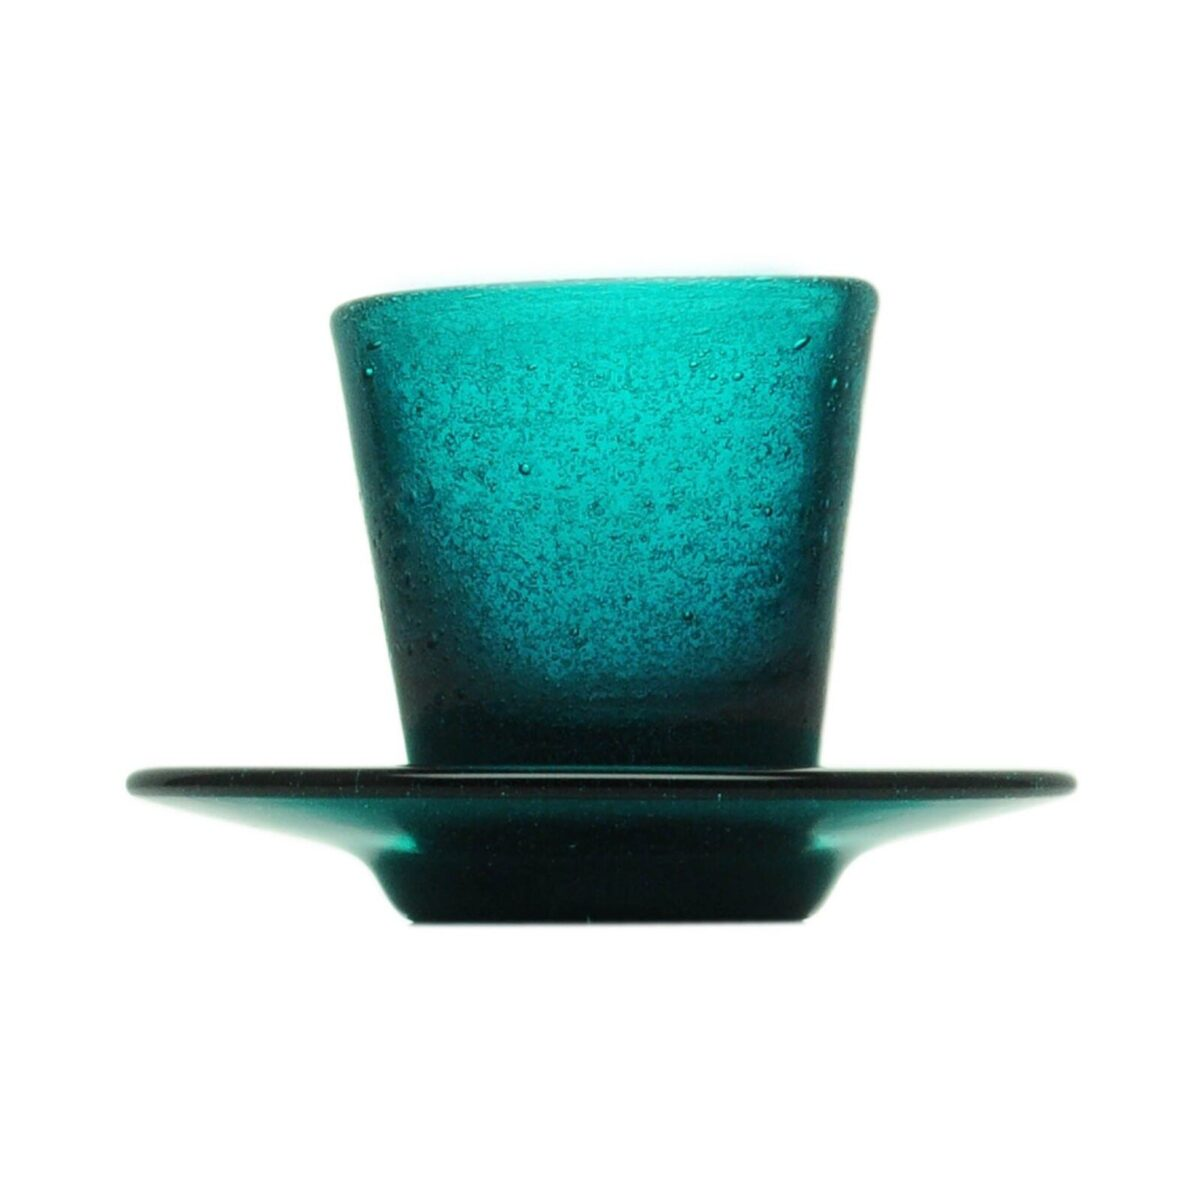 000915 - COFFEE CUP - PETROL